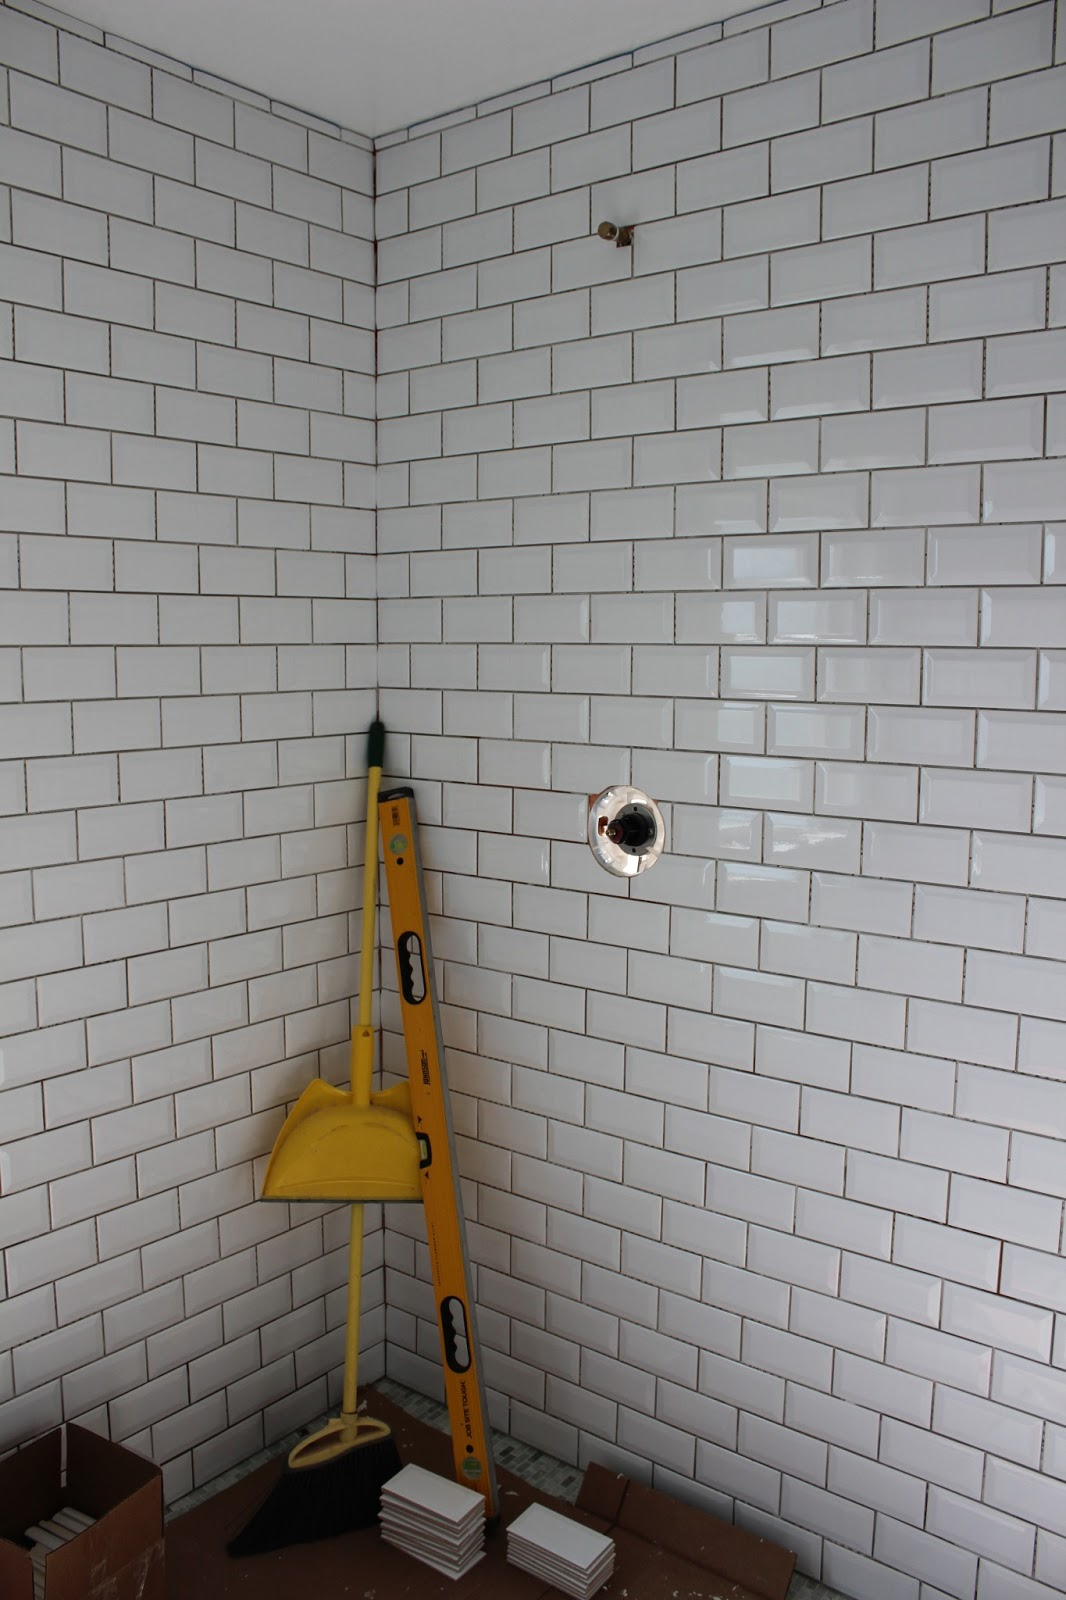 Bathroom Tile Quarter Round that last little wall of tile